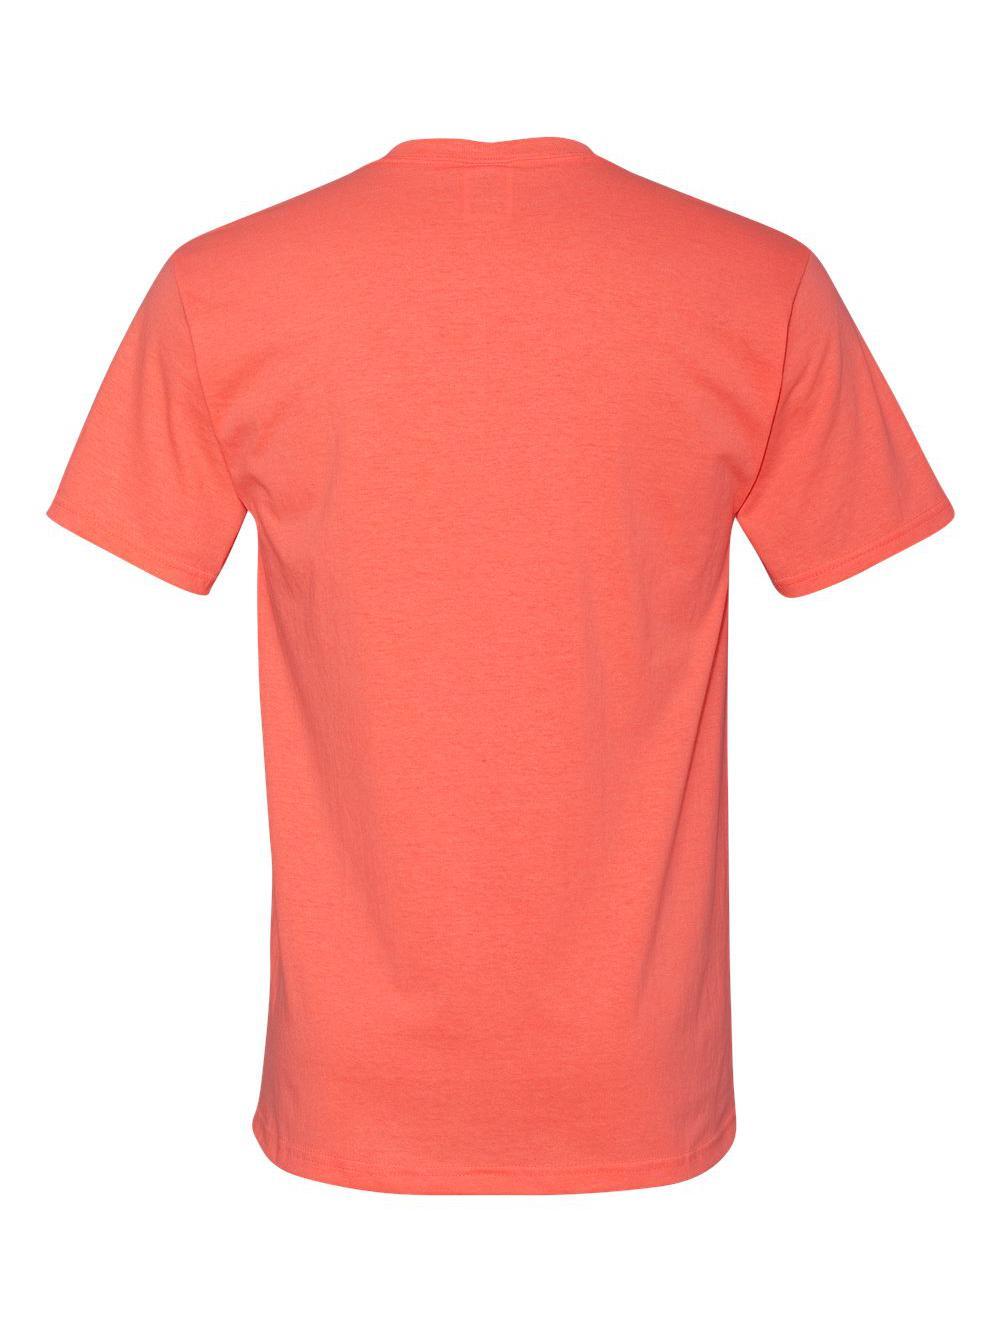 Fruit-of-the-Loom-HD-Cotton-Short-Sleeve-T-Shirt-3930R thumbnail 97